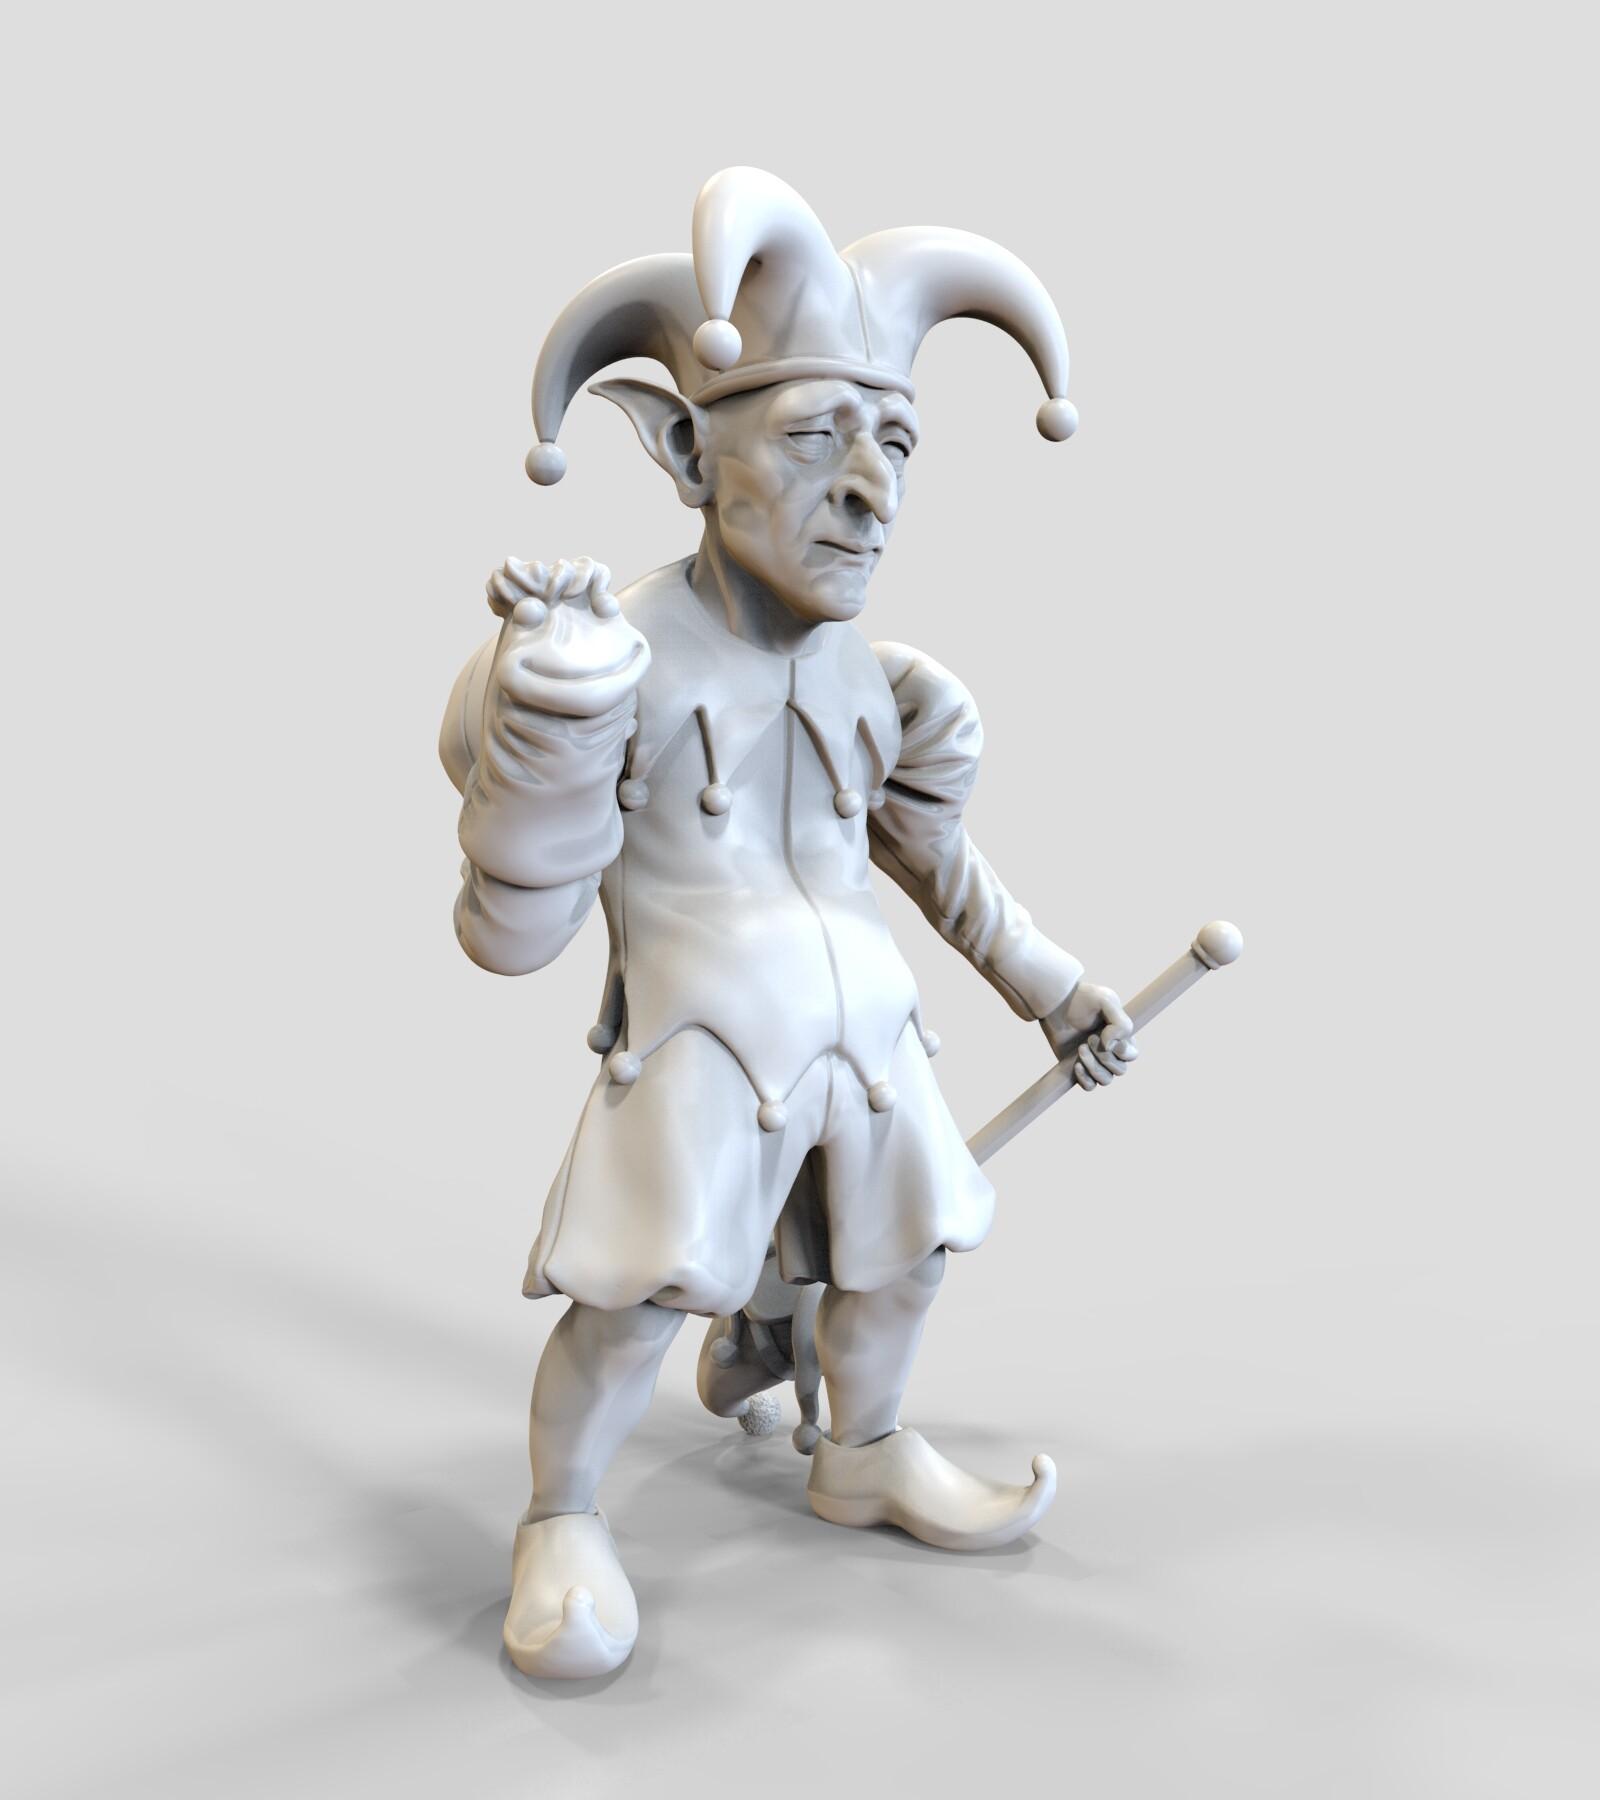 Andre de souza goblin jester 9